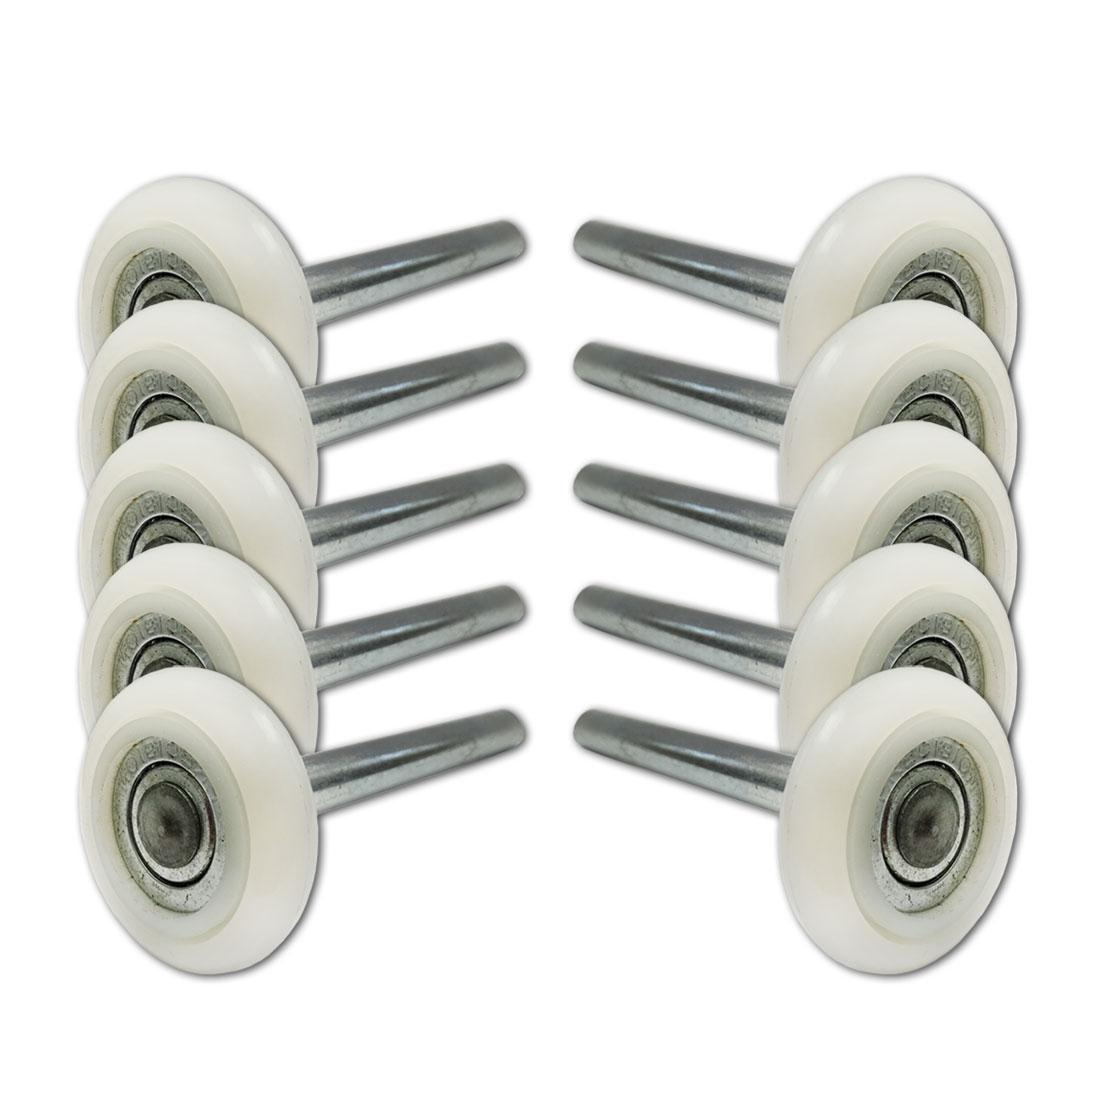 Sealed Bearing 10 PACK 4 Inch Stem 13 Ball Nylon Garage Door Rollers